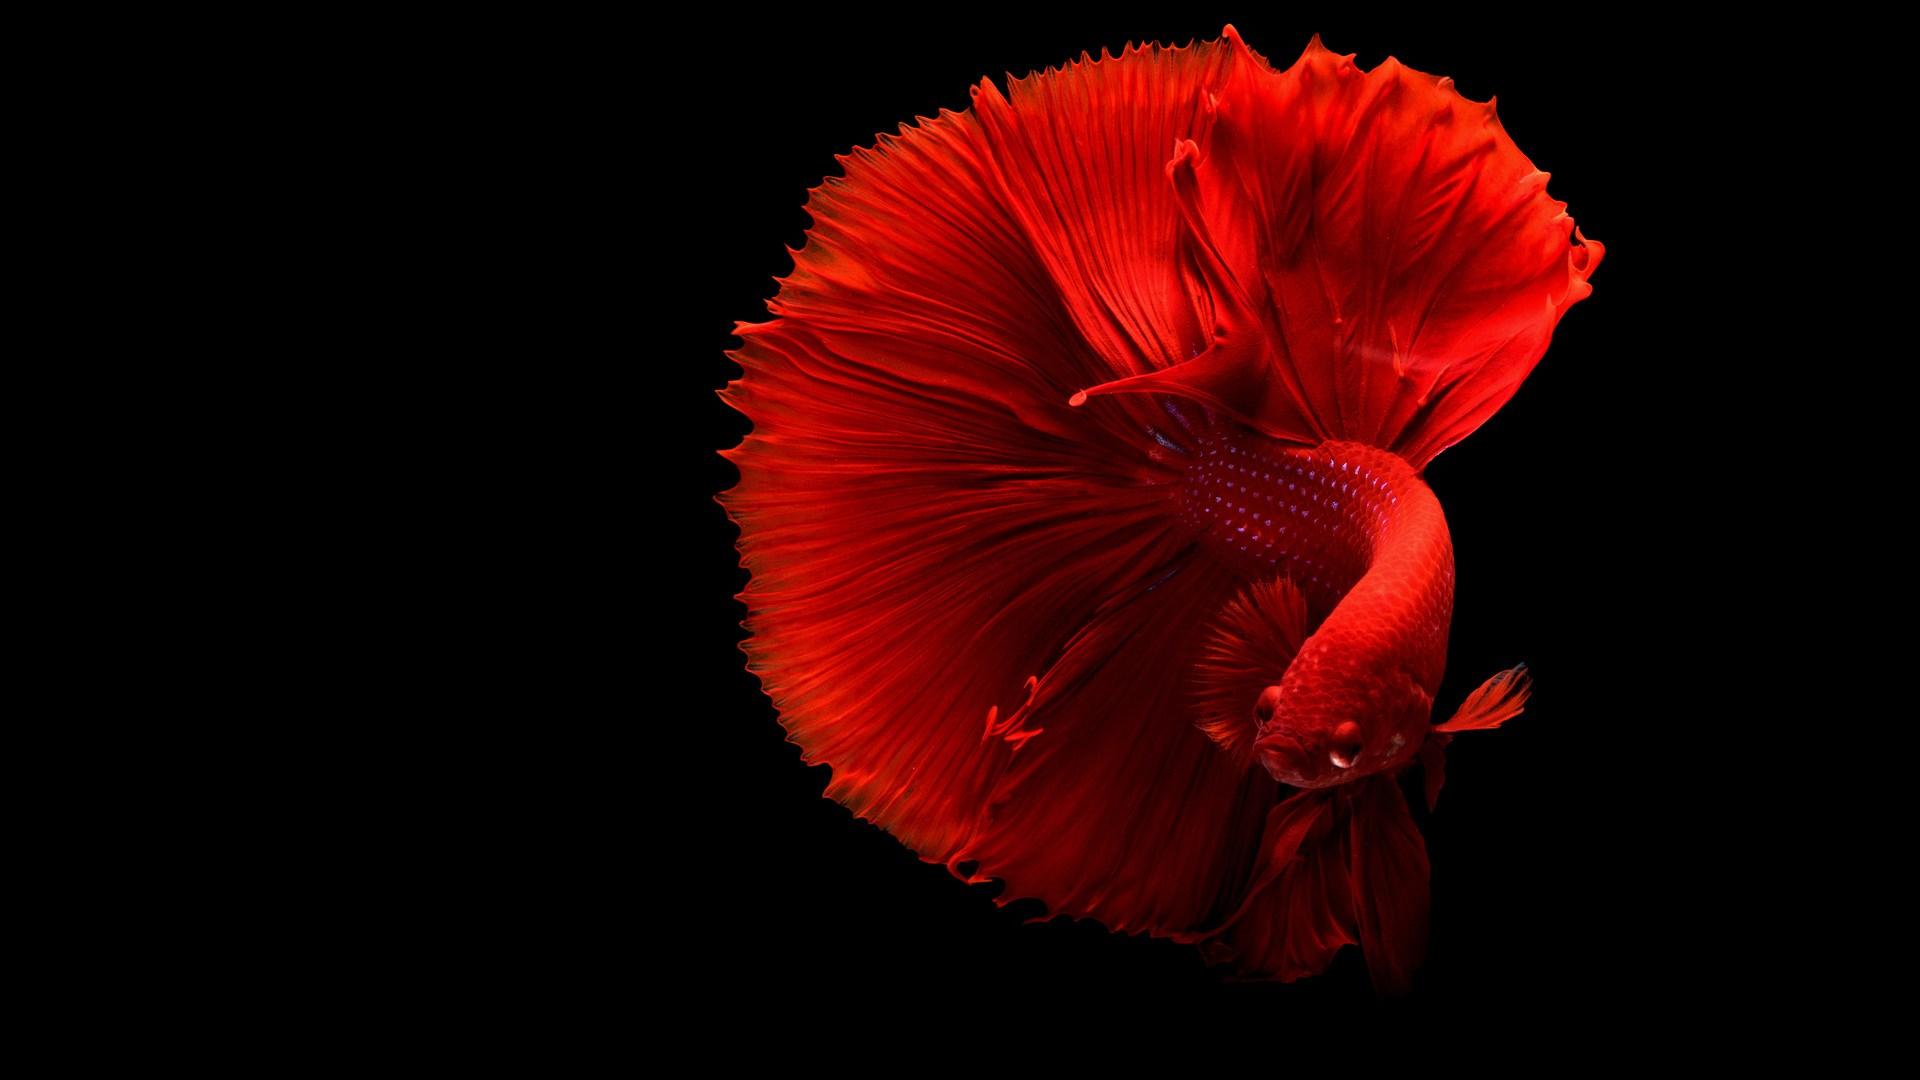 Siamese Fighting Fish 4k Laptop Full Hd 1080p Hd Red Fish